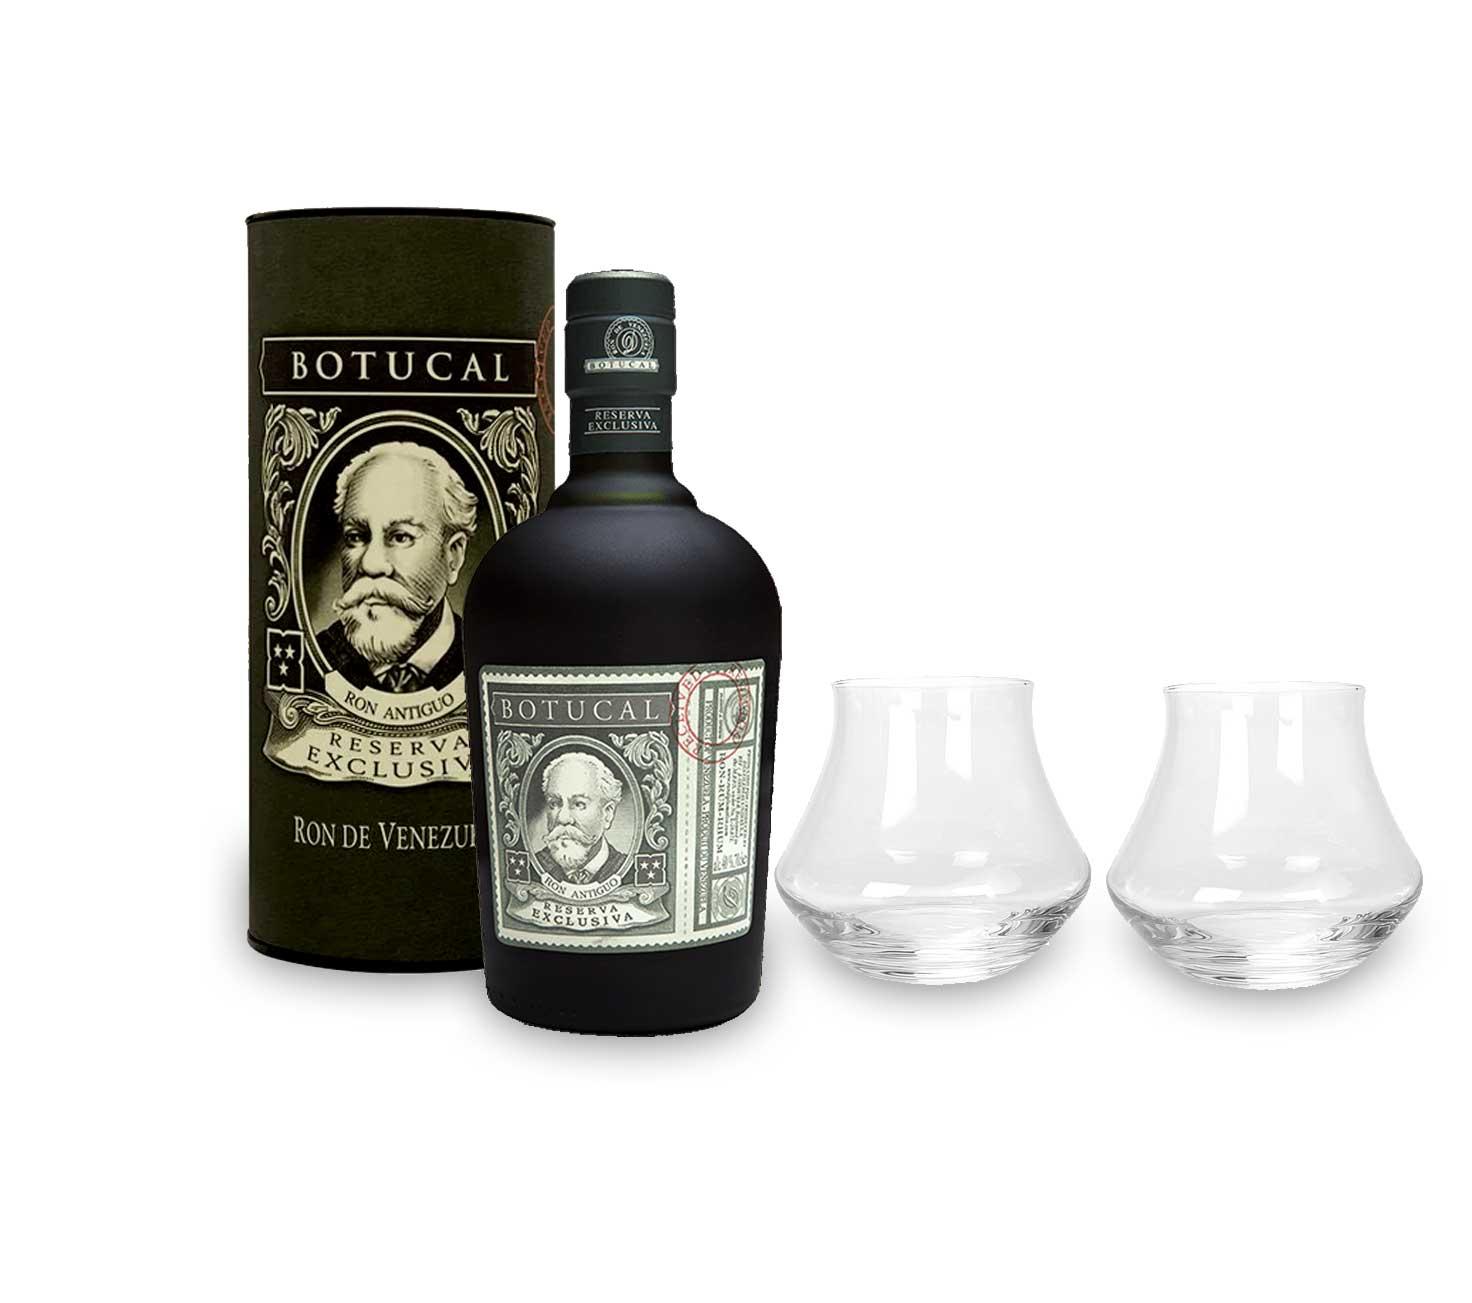 Botucal Reserva Exclusiva Rum mit Geschenkverpackung 2 Botucal Tumbler Gläser mit 0,70l (40% Vol) Ron de Venezuela Glas Longdrinkglas - Set - [Enthält Sulfite]